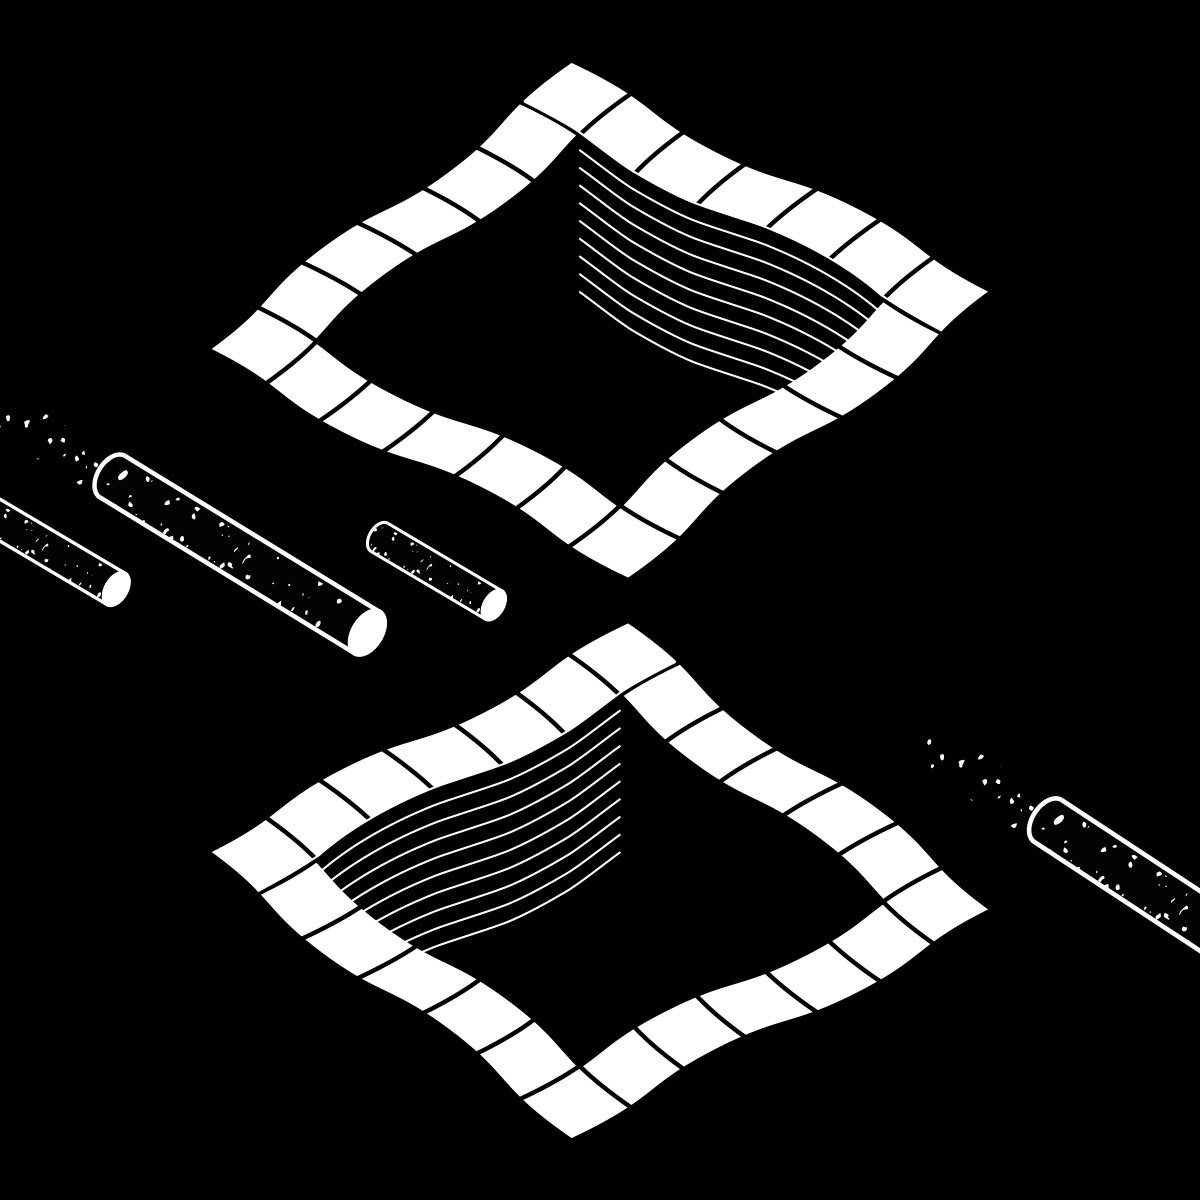 illustration, bw, geometry, space - davidbenmussa | ello